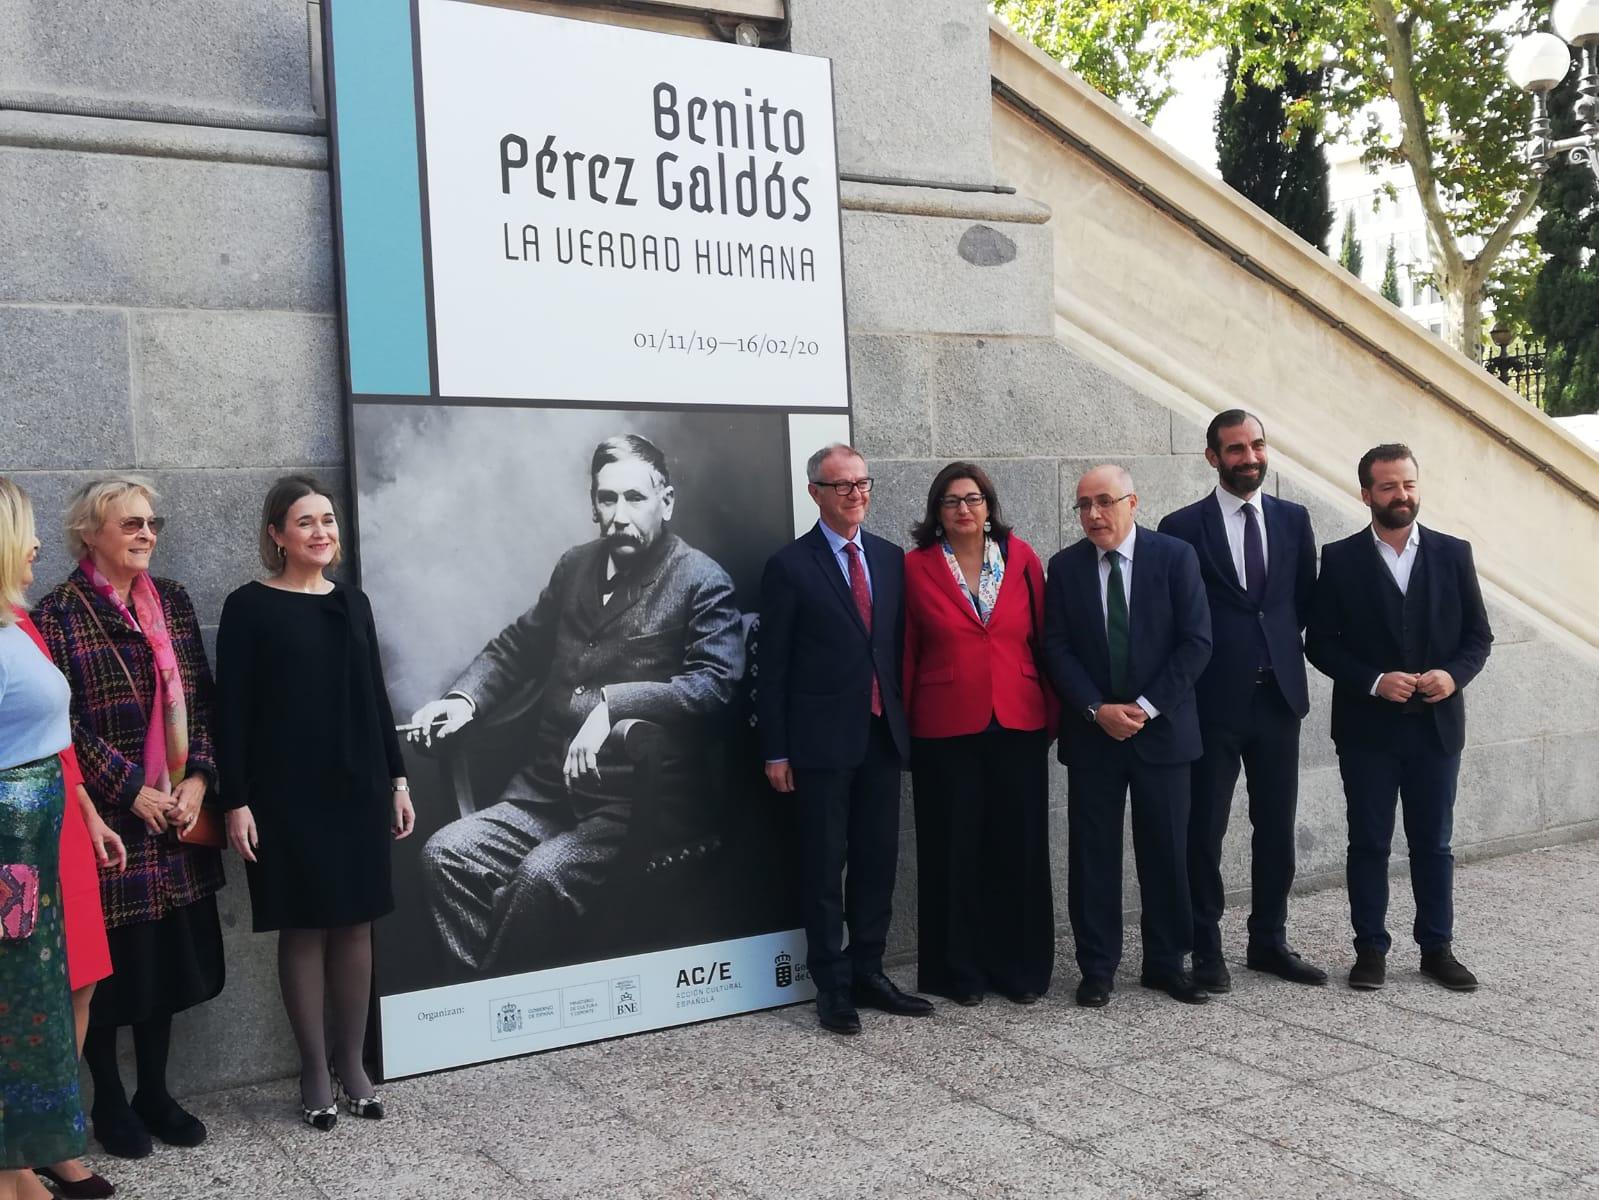 http://www.bne.es/es/Inicio/index.html